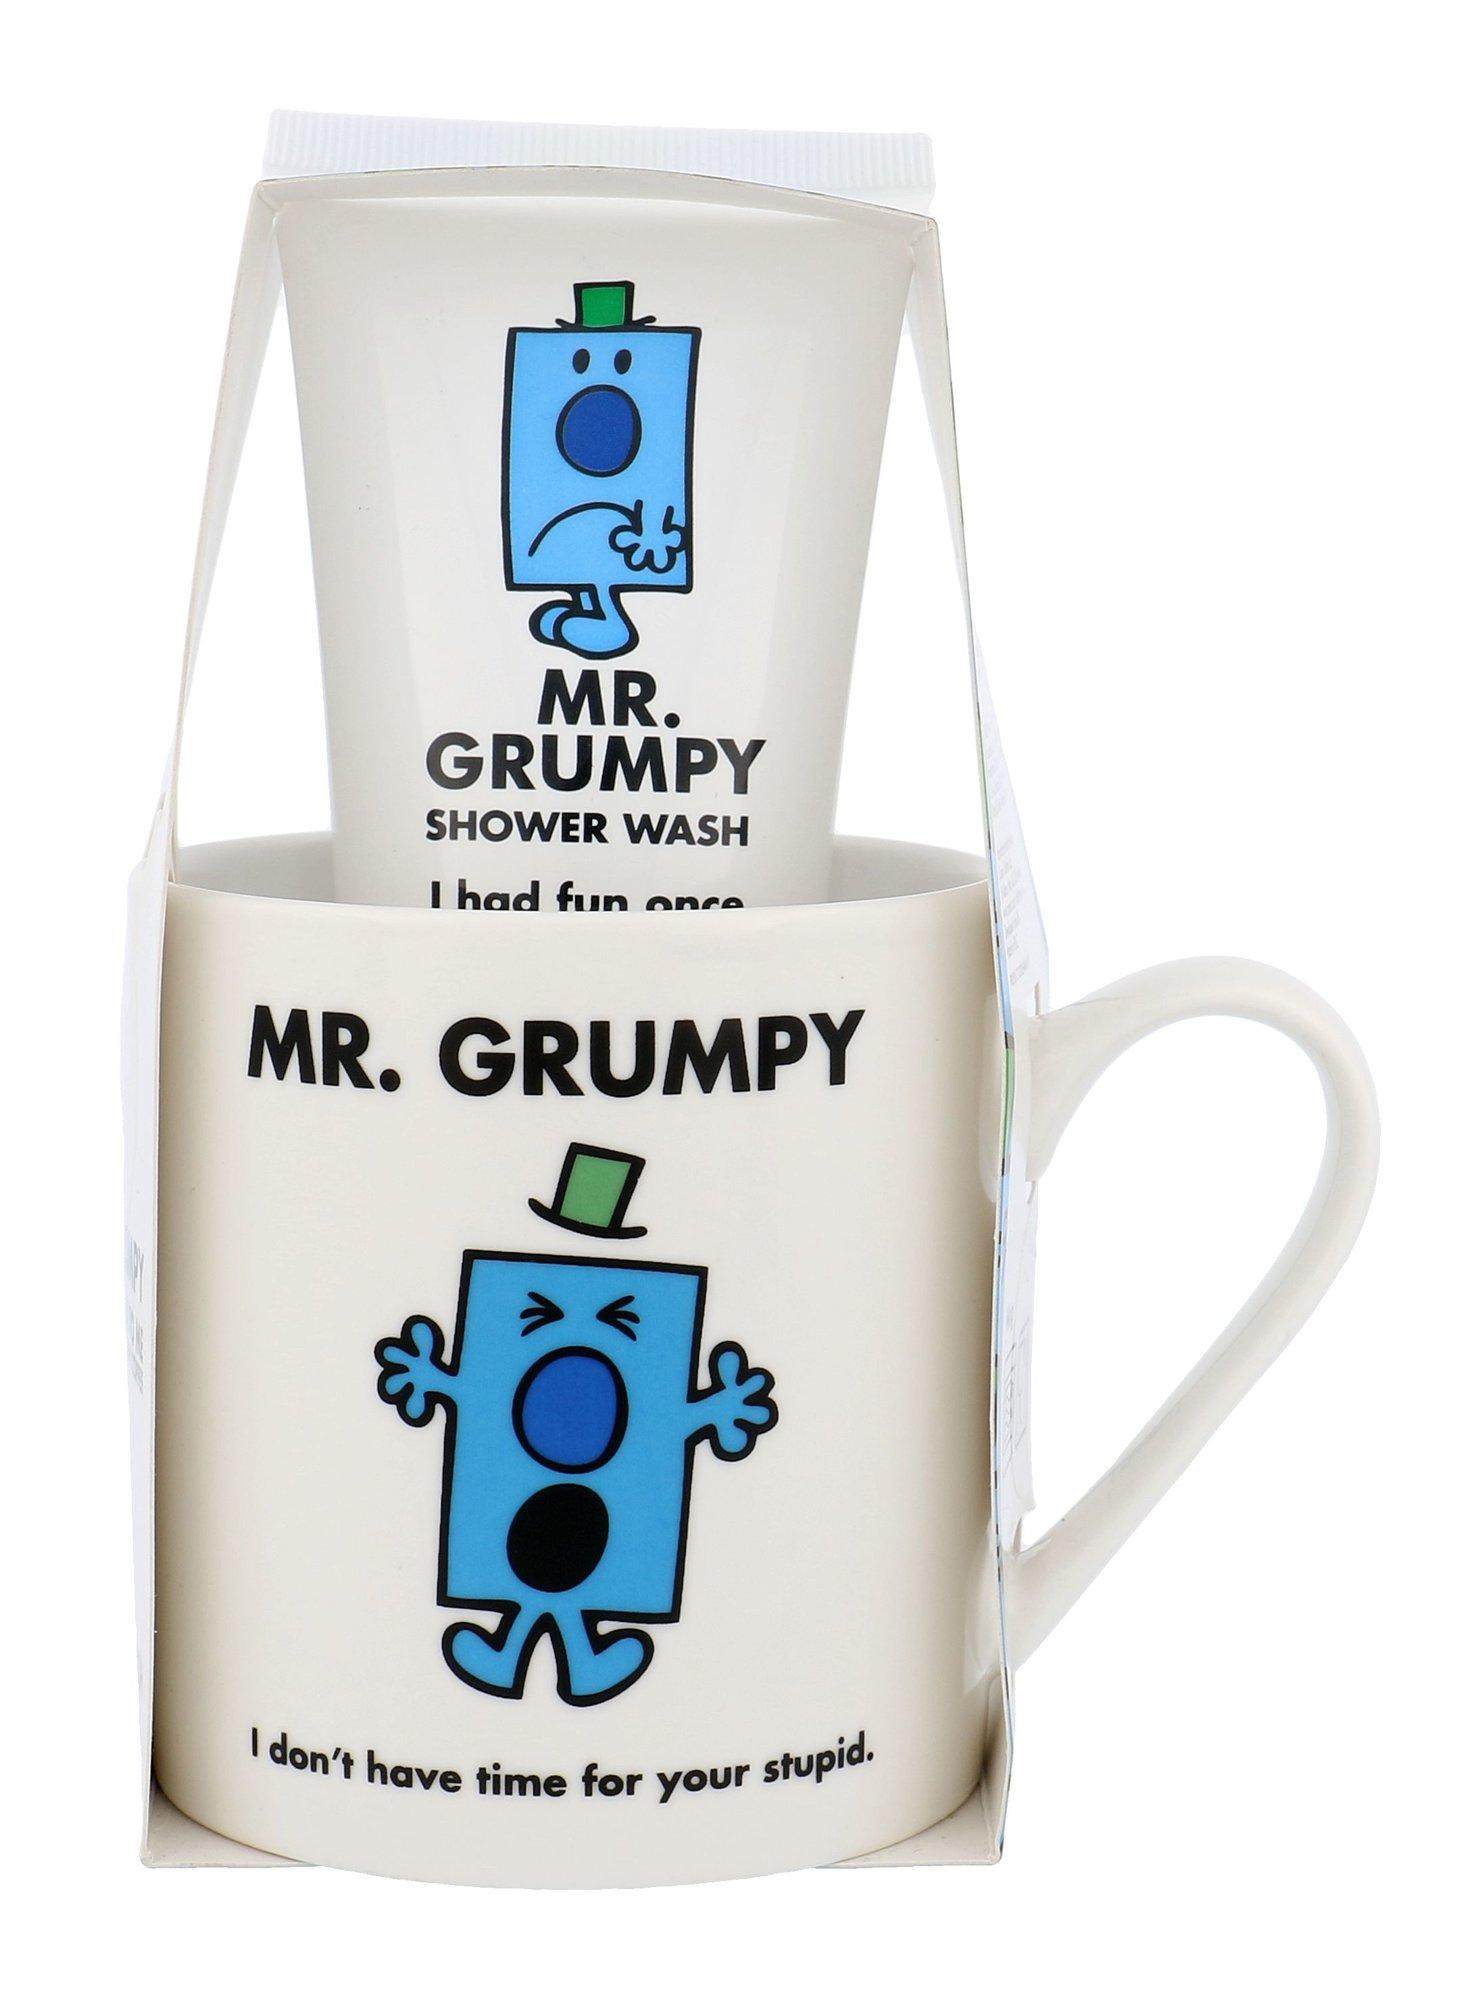 Mr. Grumpy Mr. Grumpy Shower gel 100ml